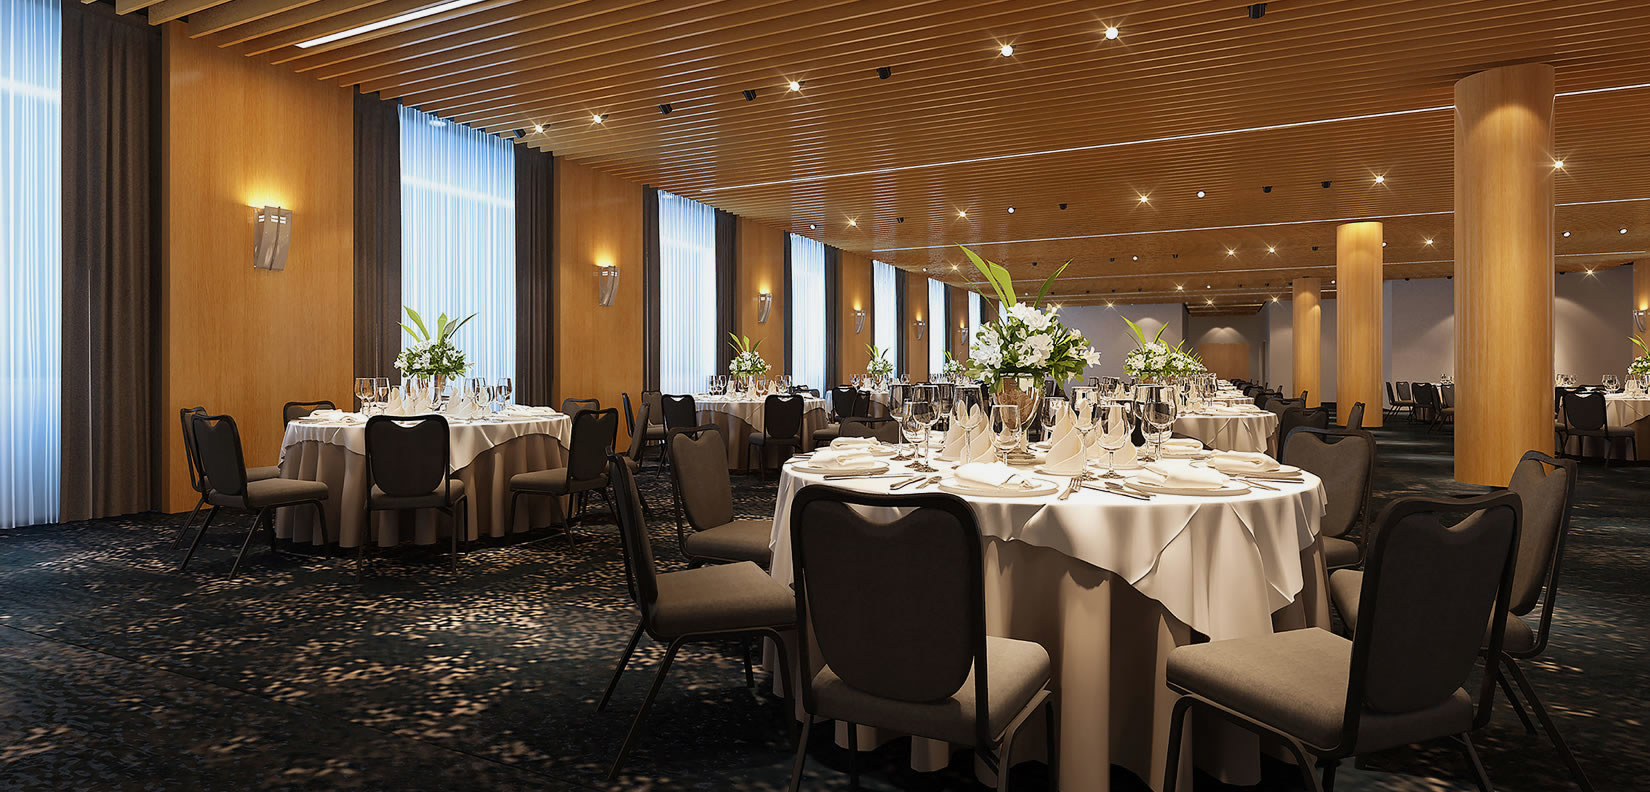 Our seattle wedding venues wedding venues in wa state hotel our seattle wedding venues junglespirit Gallery